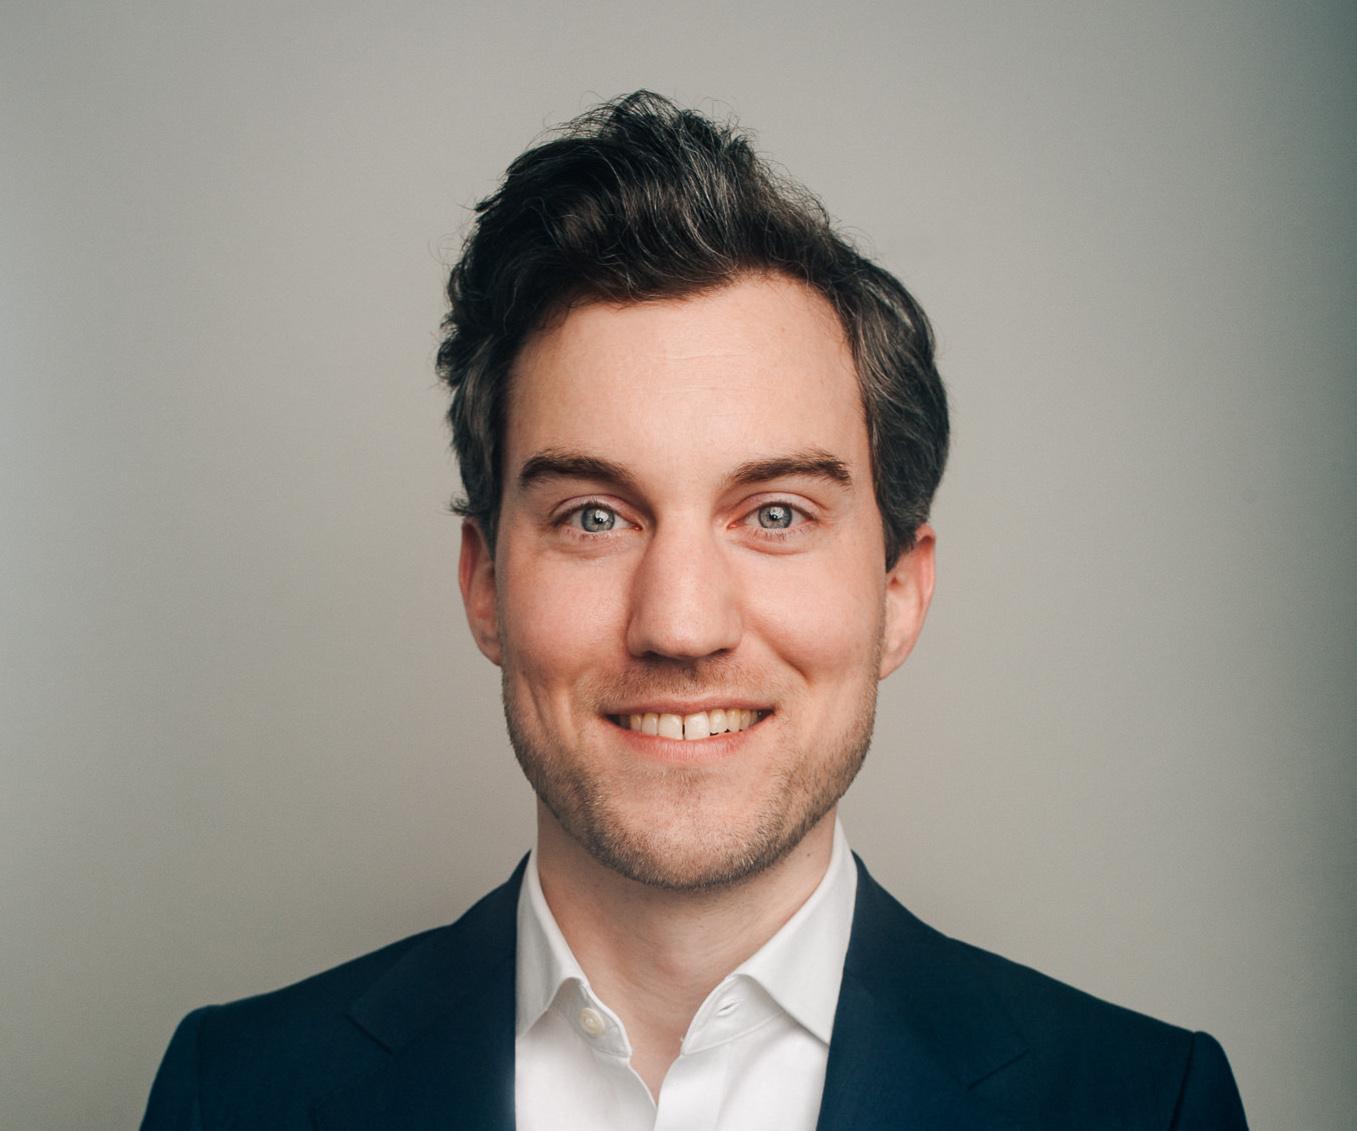 LINUS Digital Finance gewinnt Dr. Christopher Danwerth, LL.M. als Head of Legal